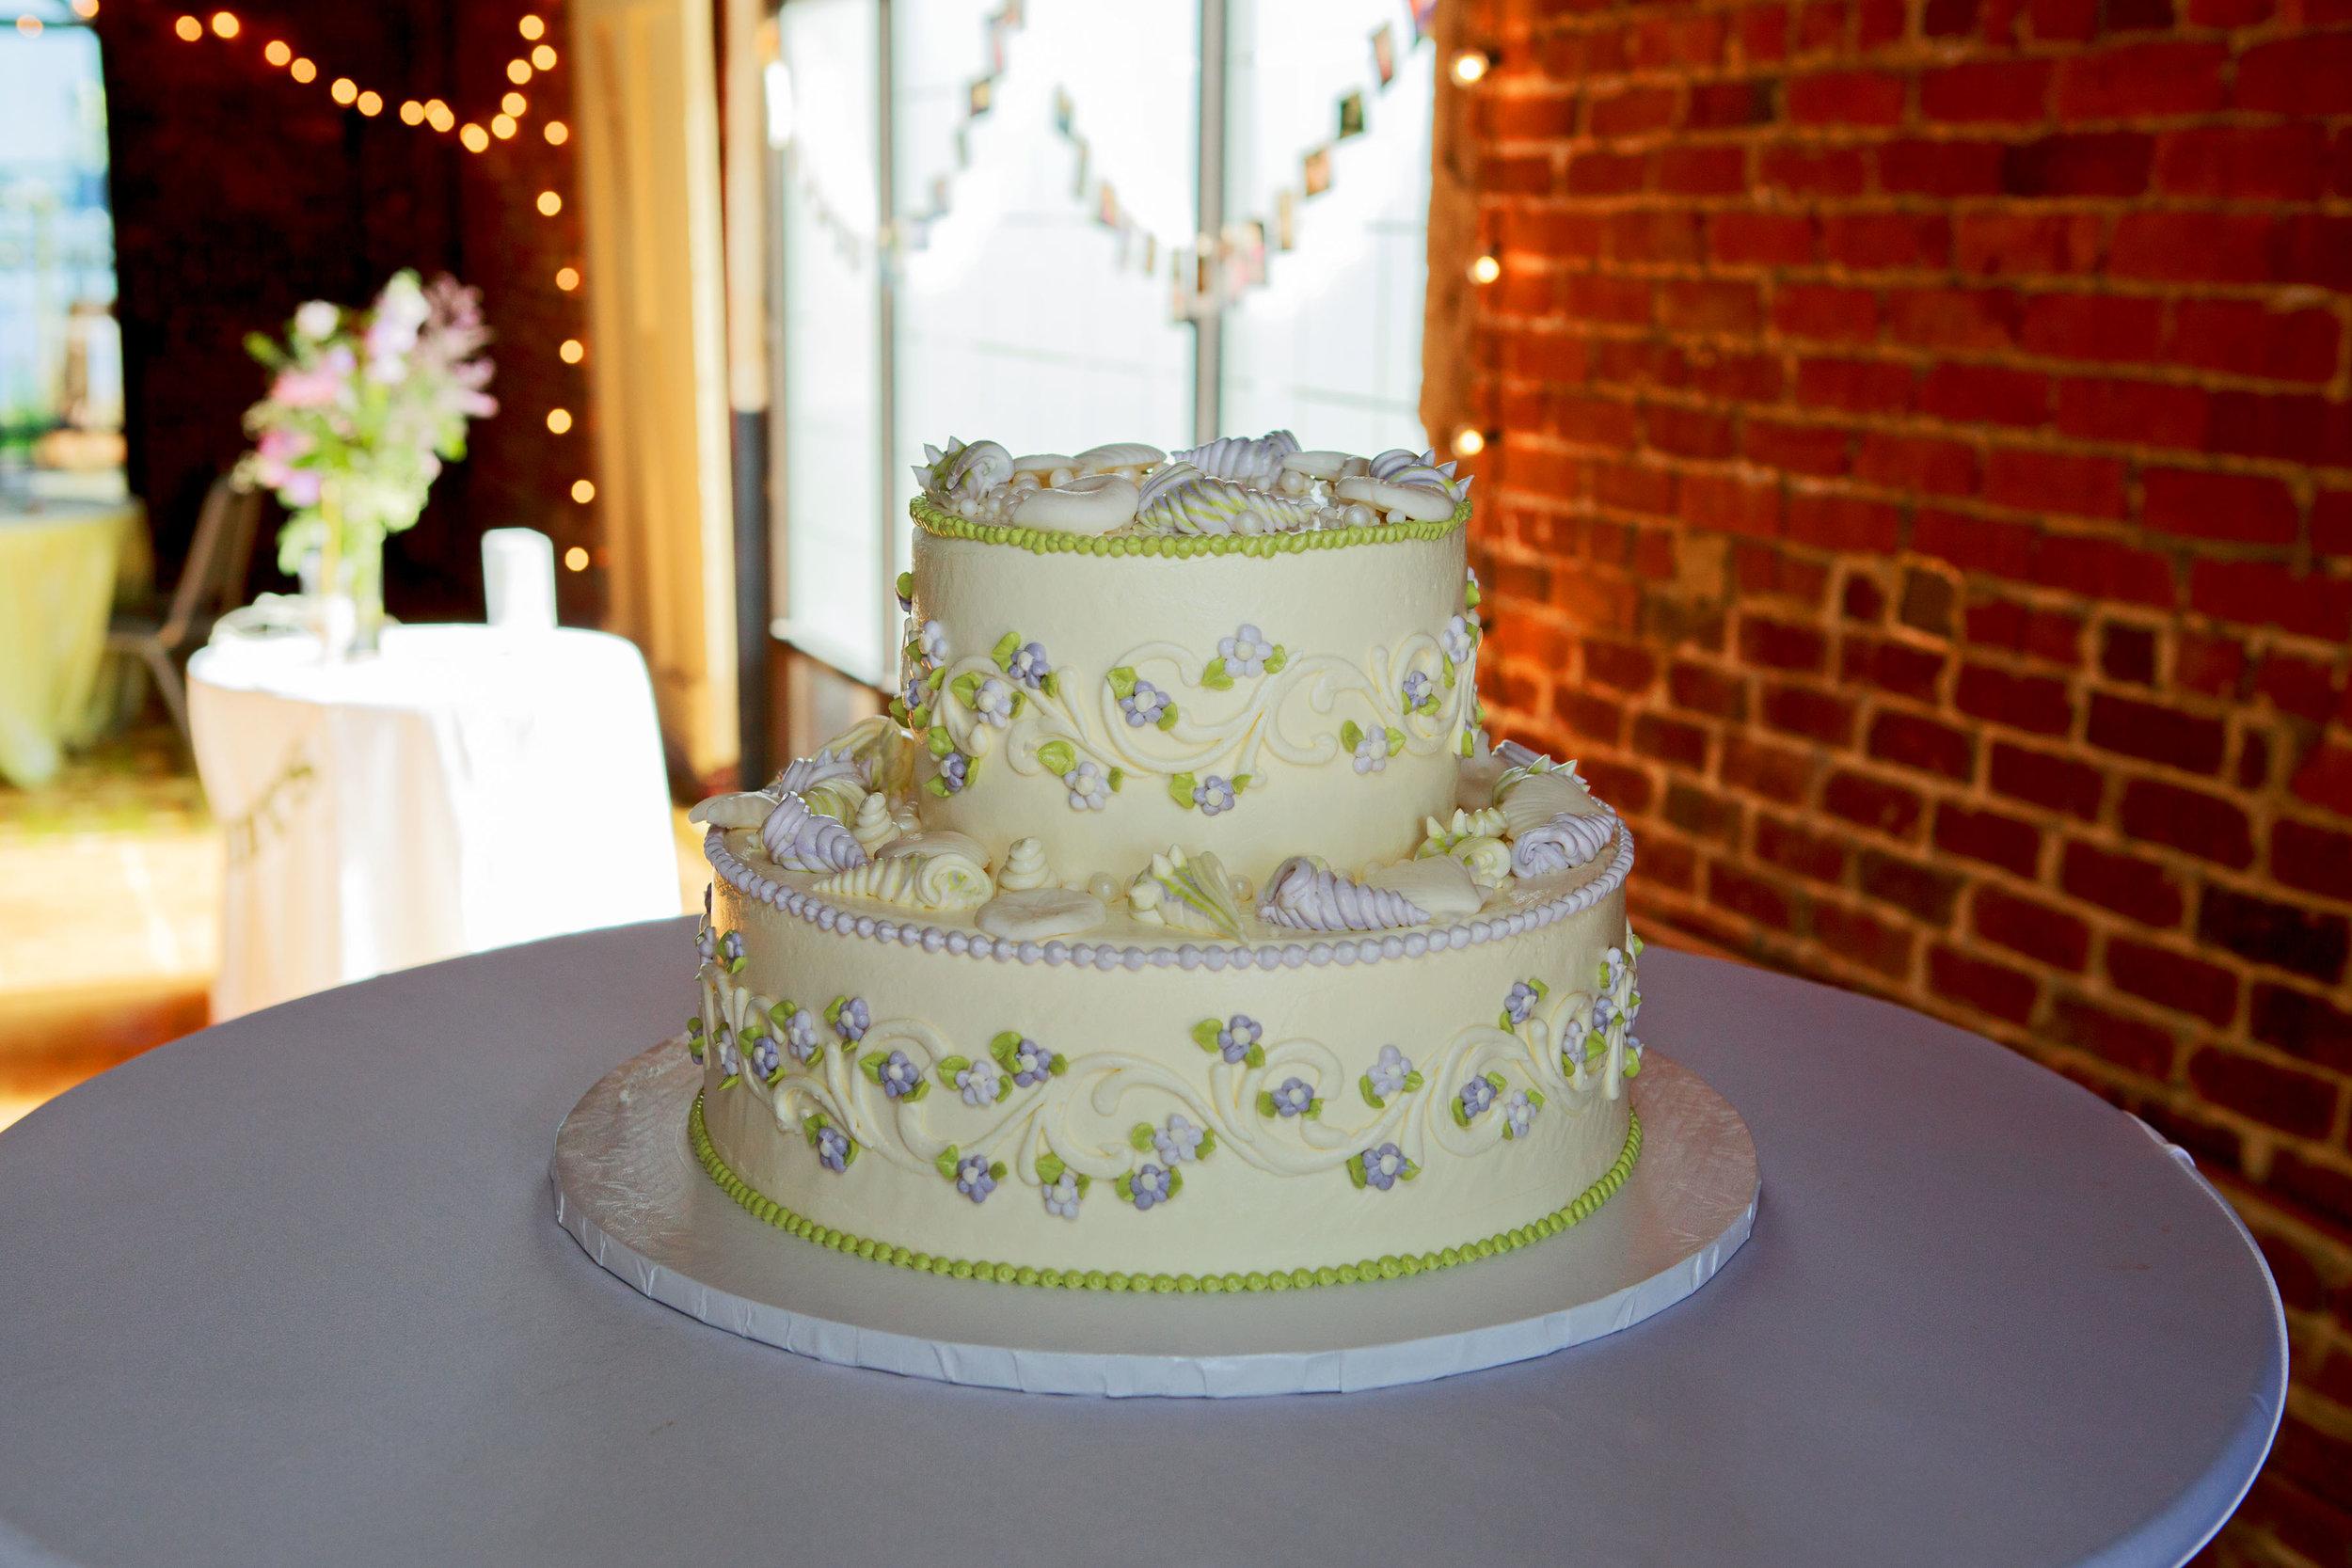 North_Carolina_Wedding_Photographer_Tiffany_Abruzzo_Reception_4.jpg